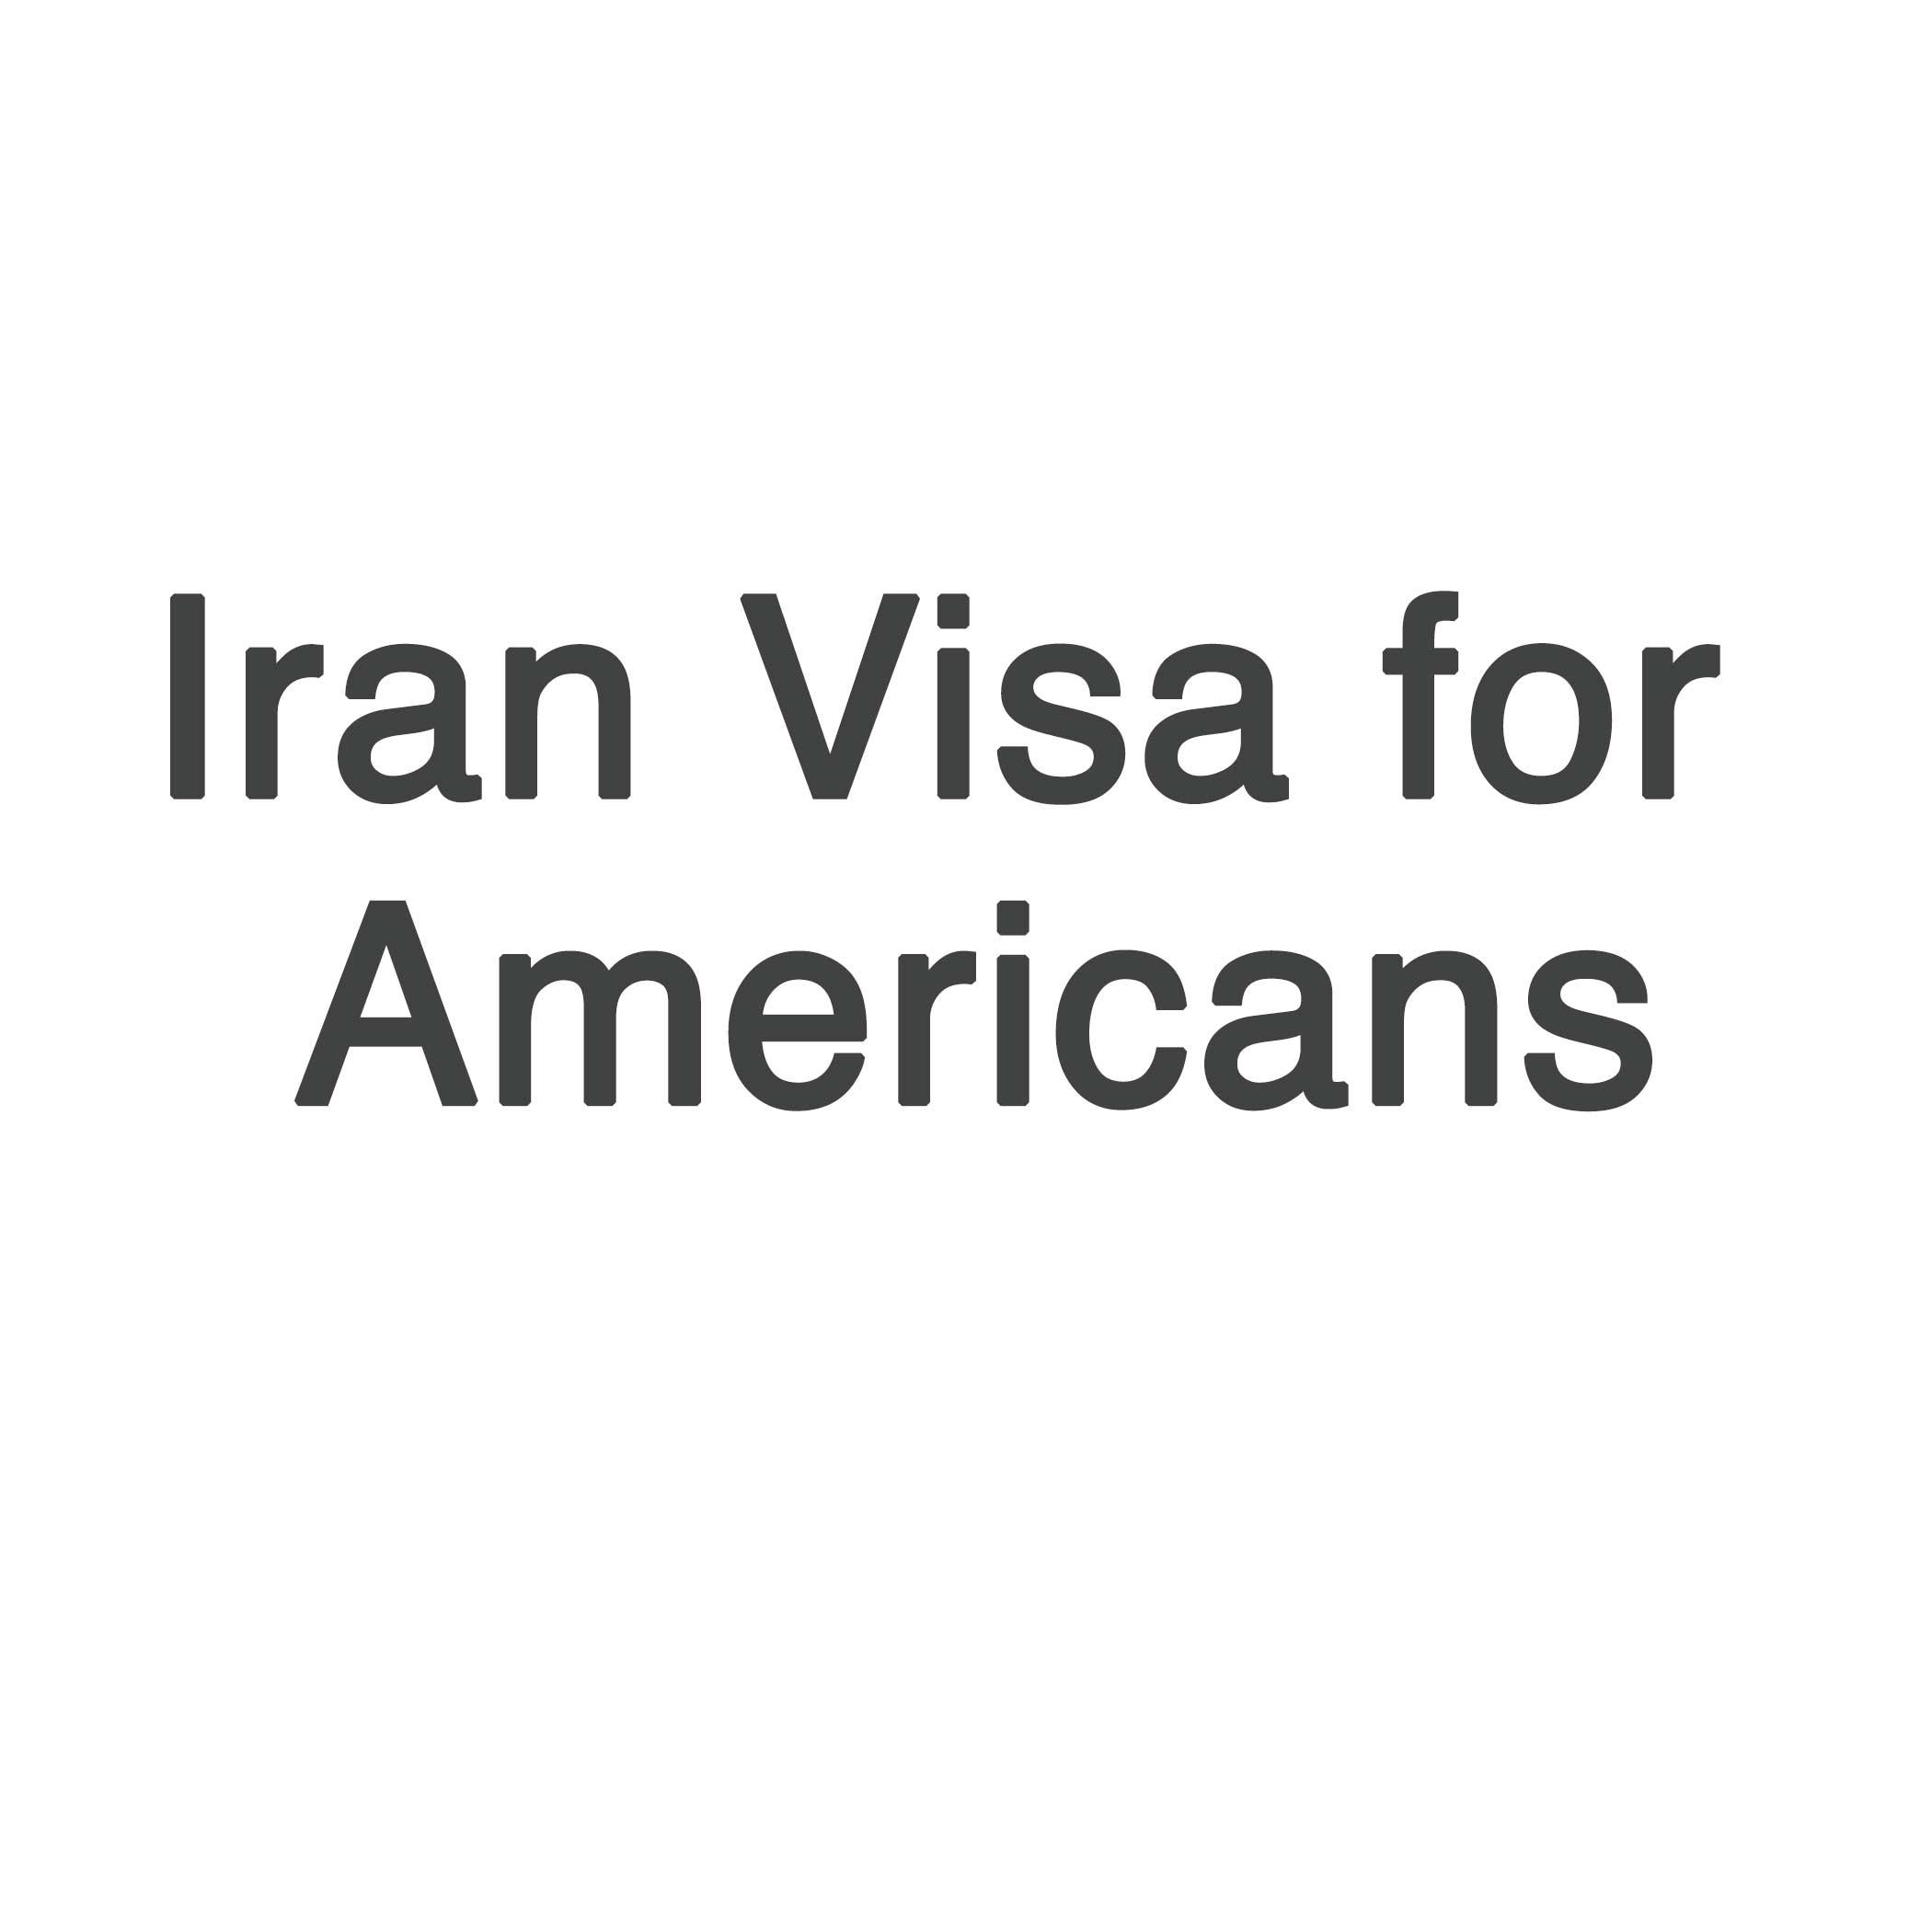 iran-visa-for-americans